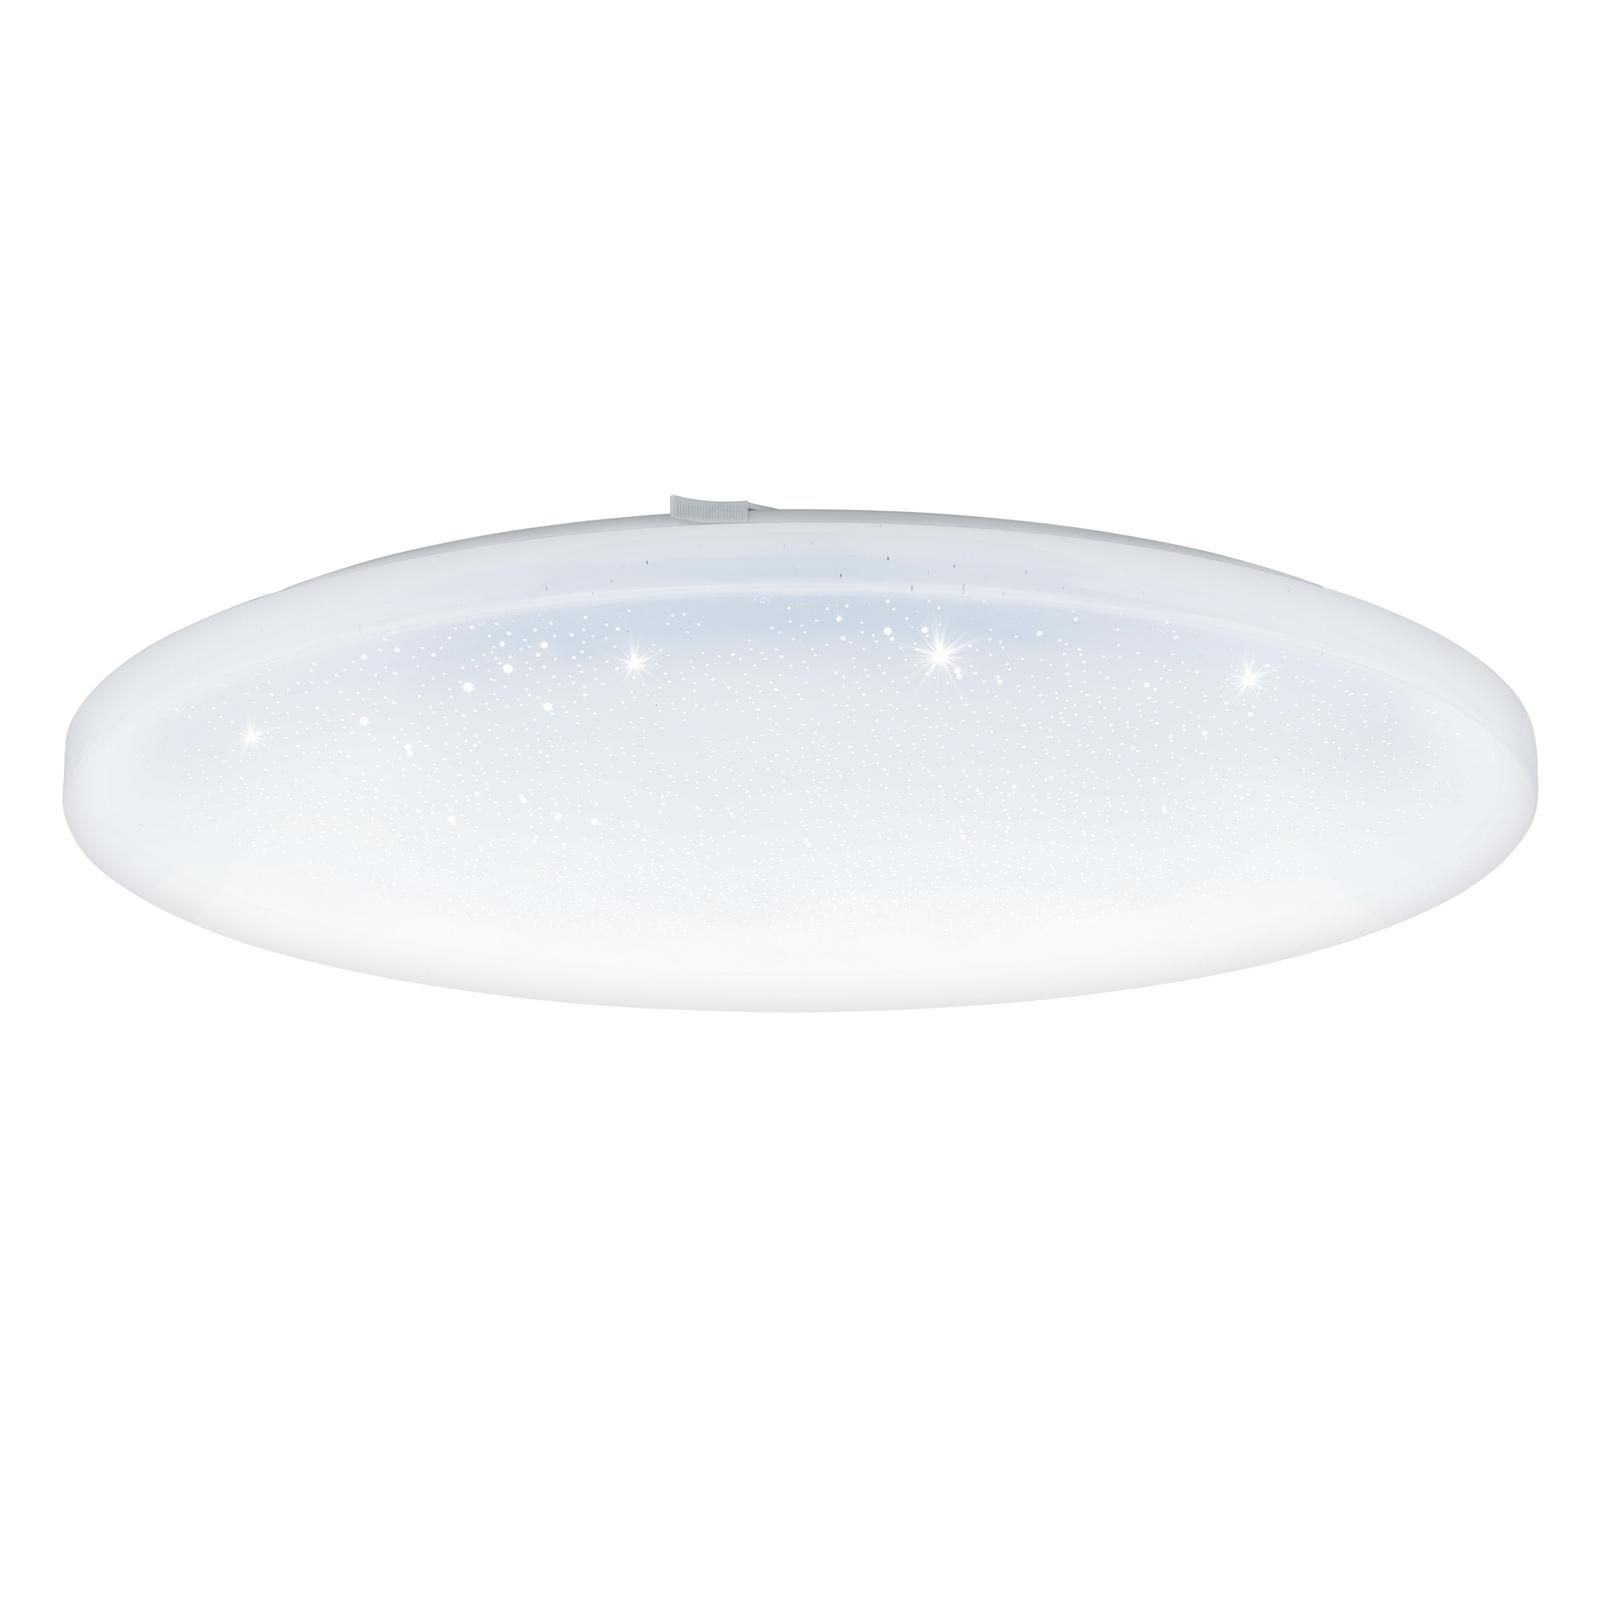 LED plafondlamp Frania met kristaleffect, rond